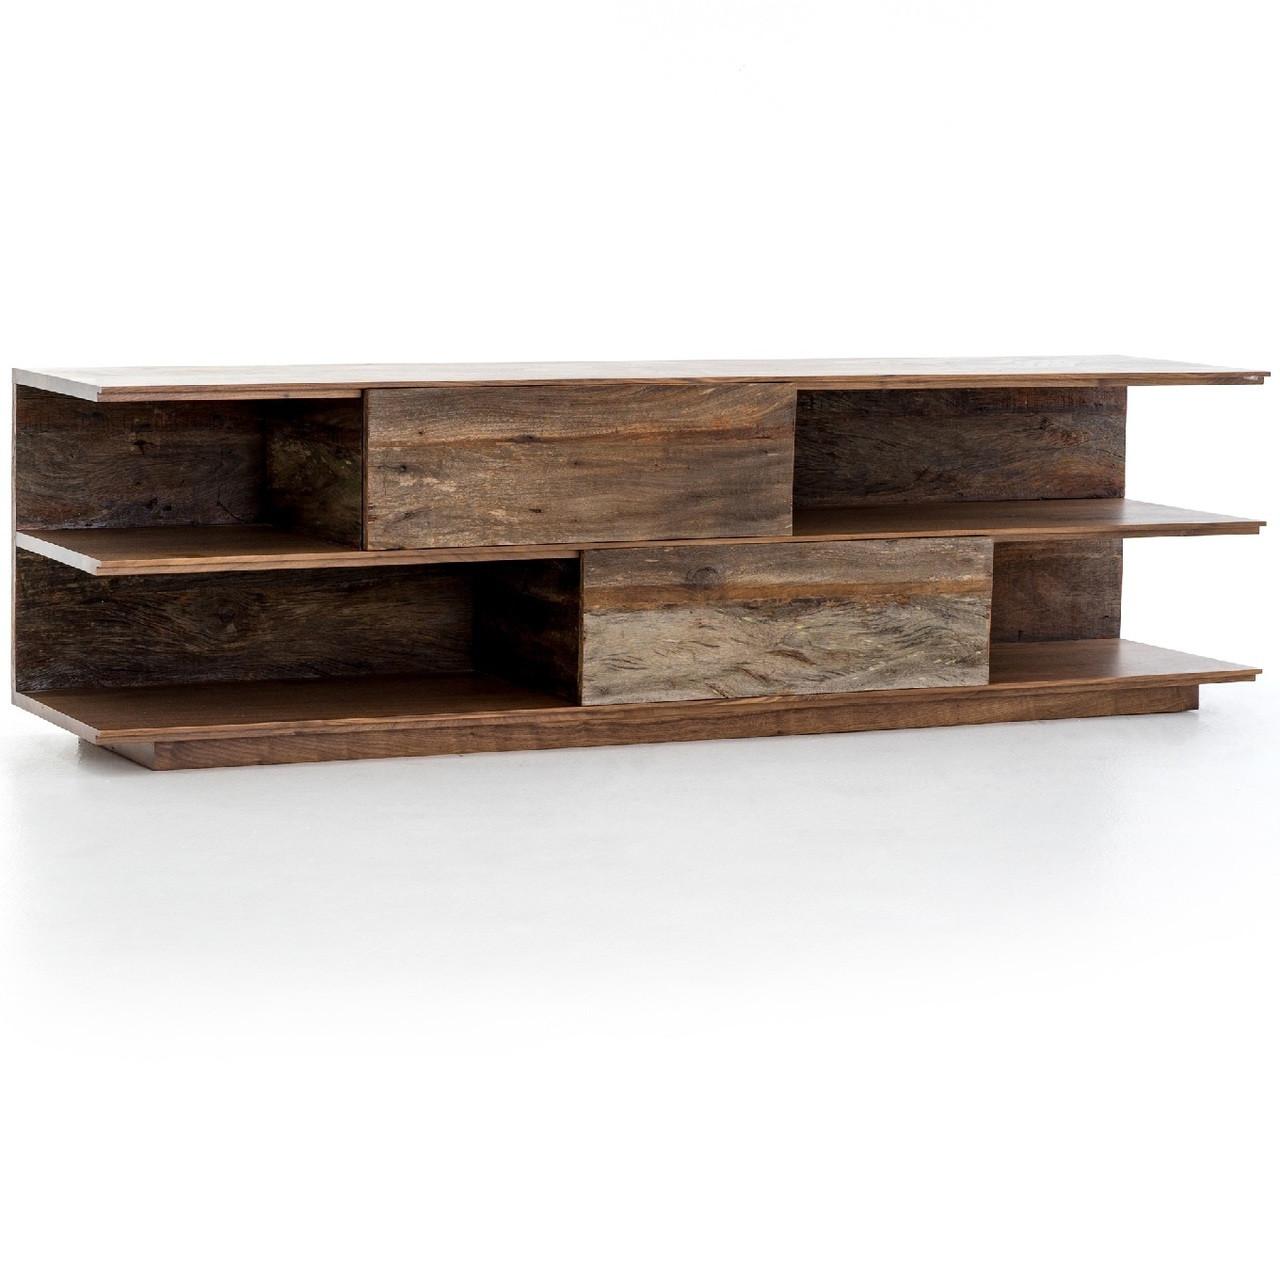 peroba wood furniture. Bina,Craig Reclaimed Peroba Wood Large Media Console Furniture T